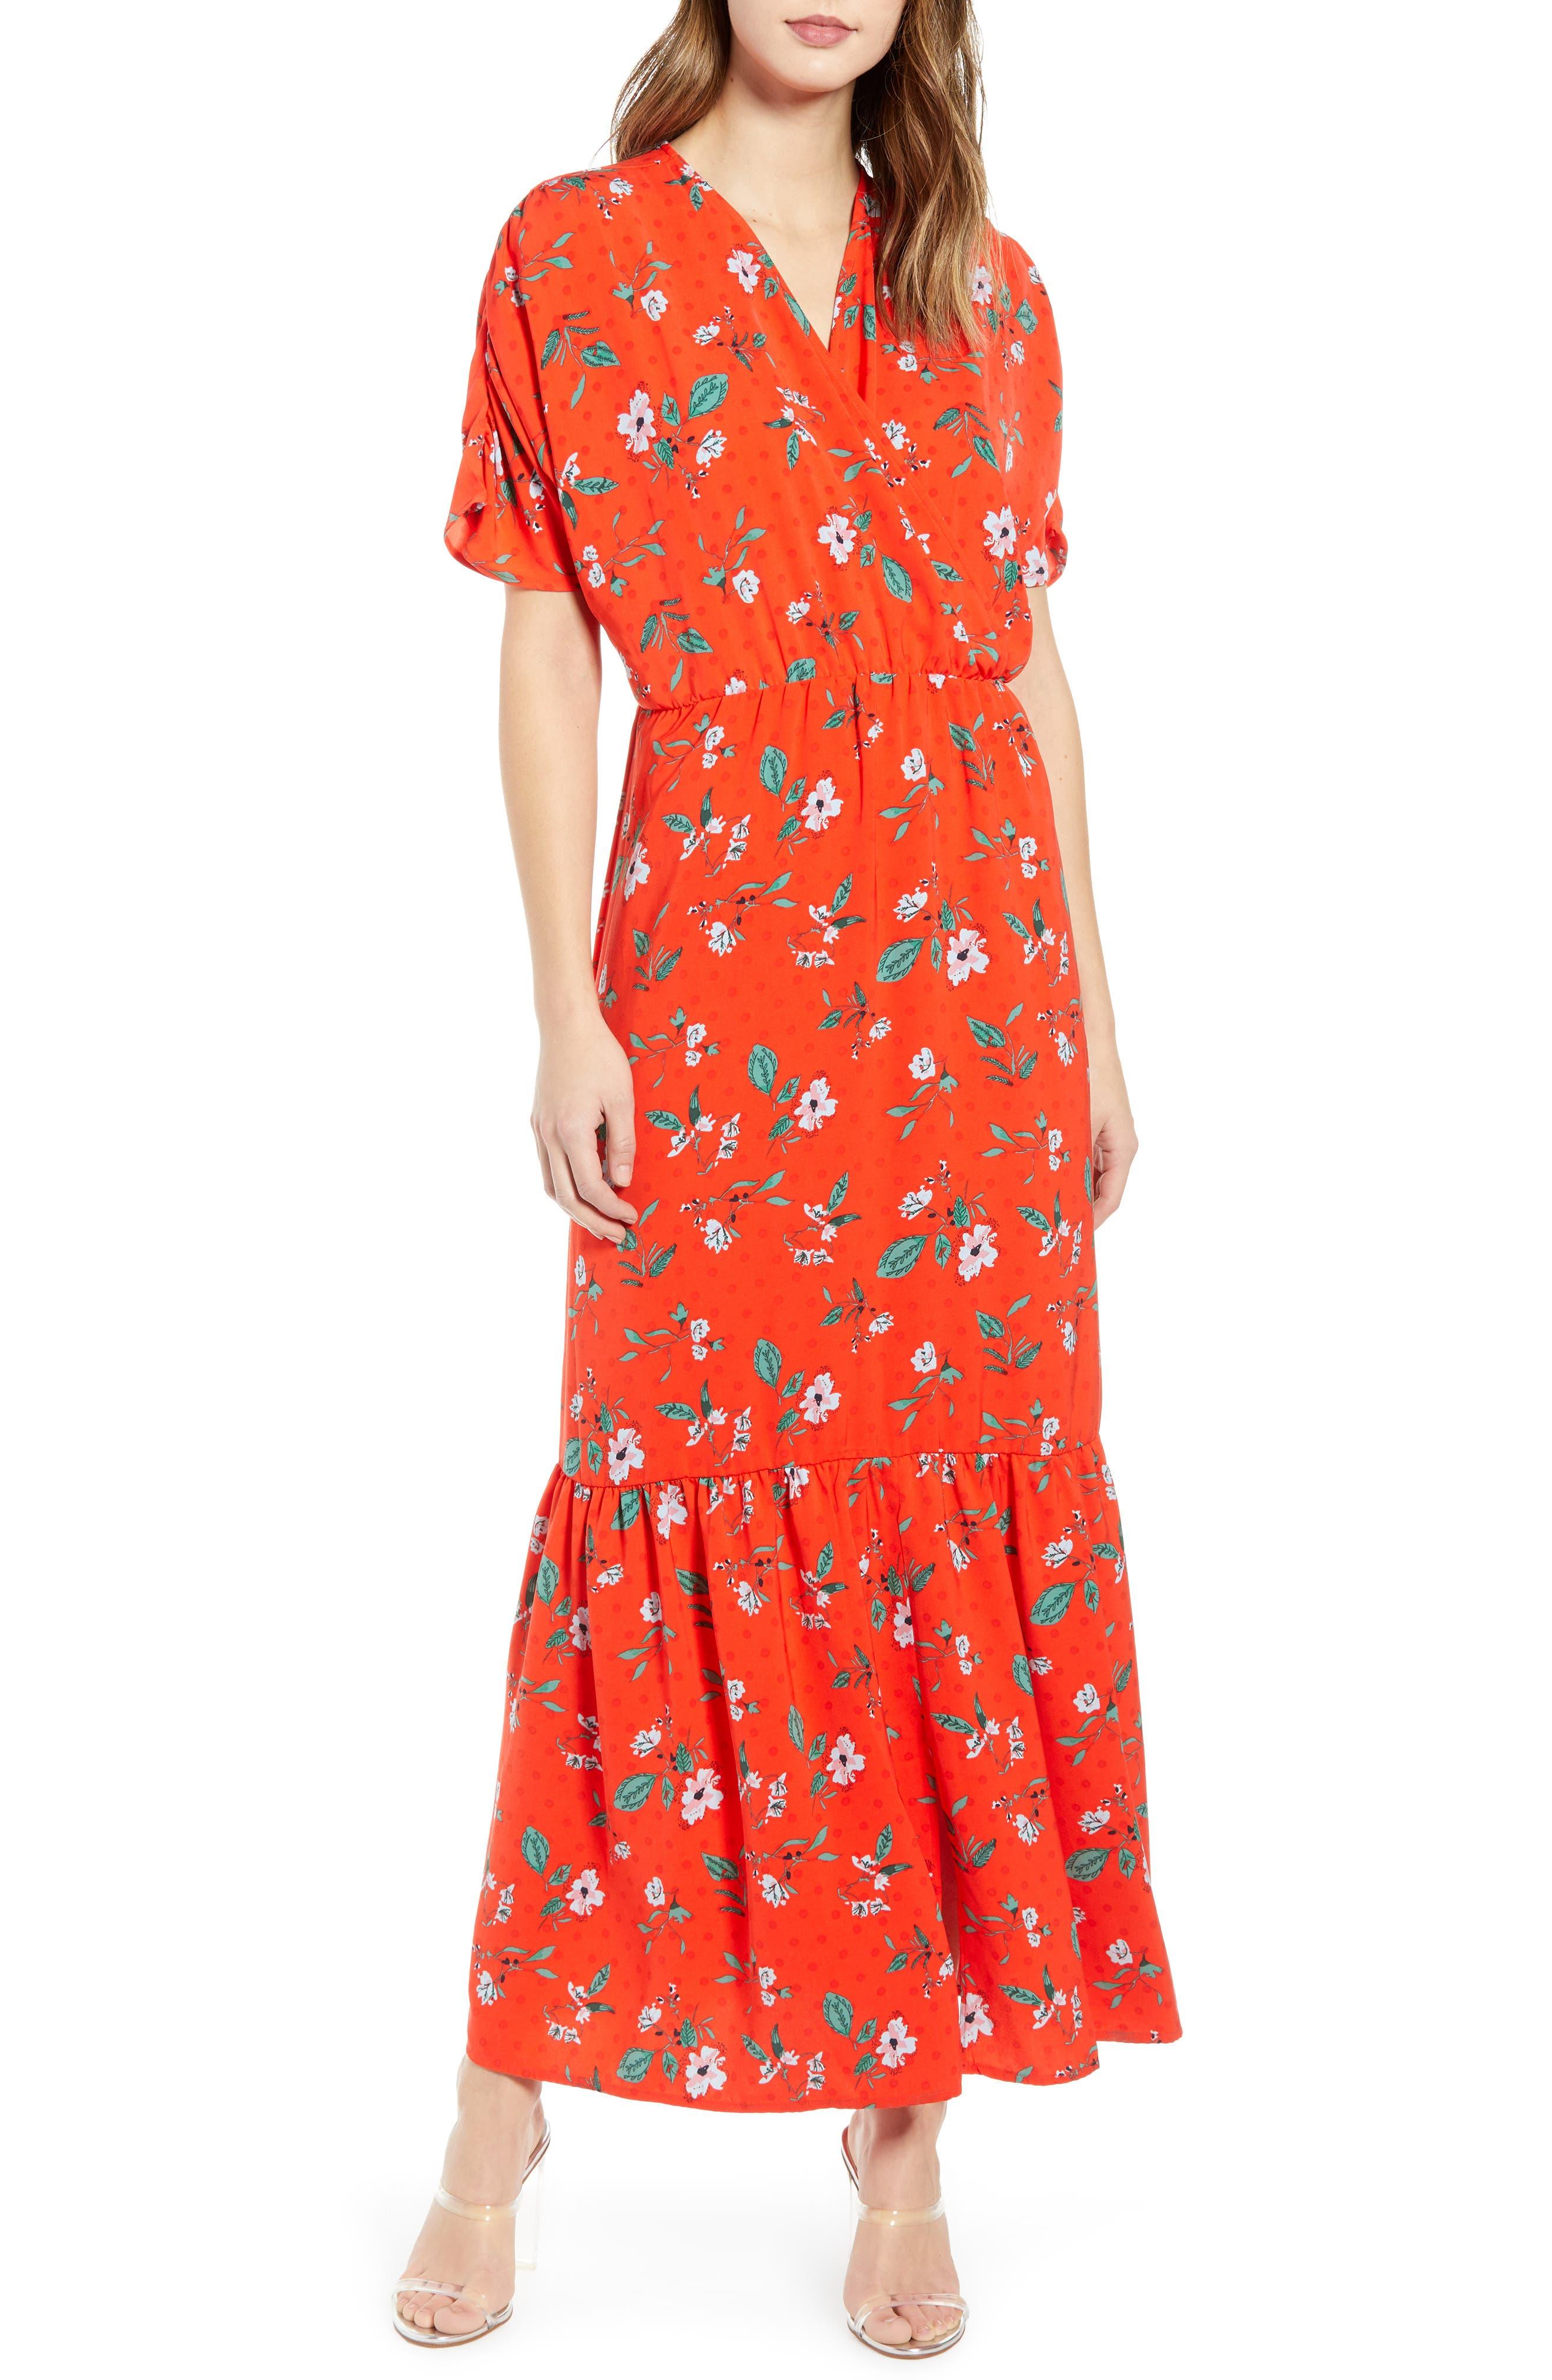 Vero Moda Ava Maxi Dress, Red